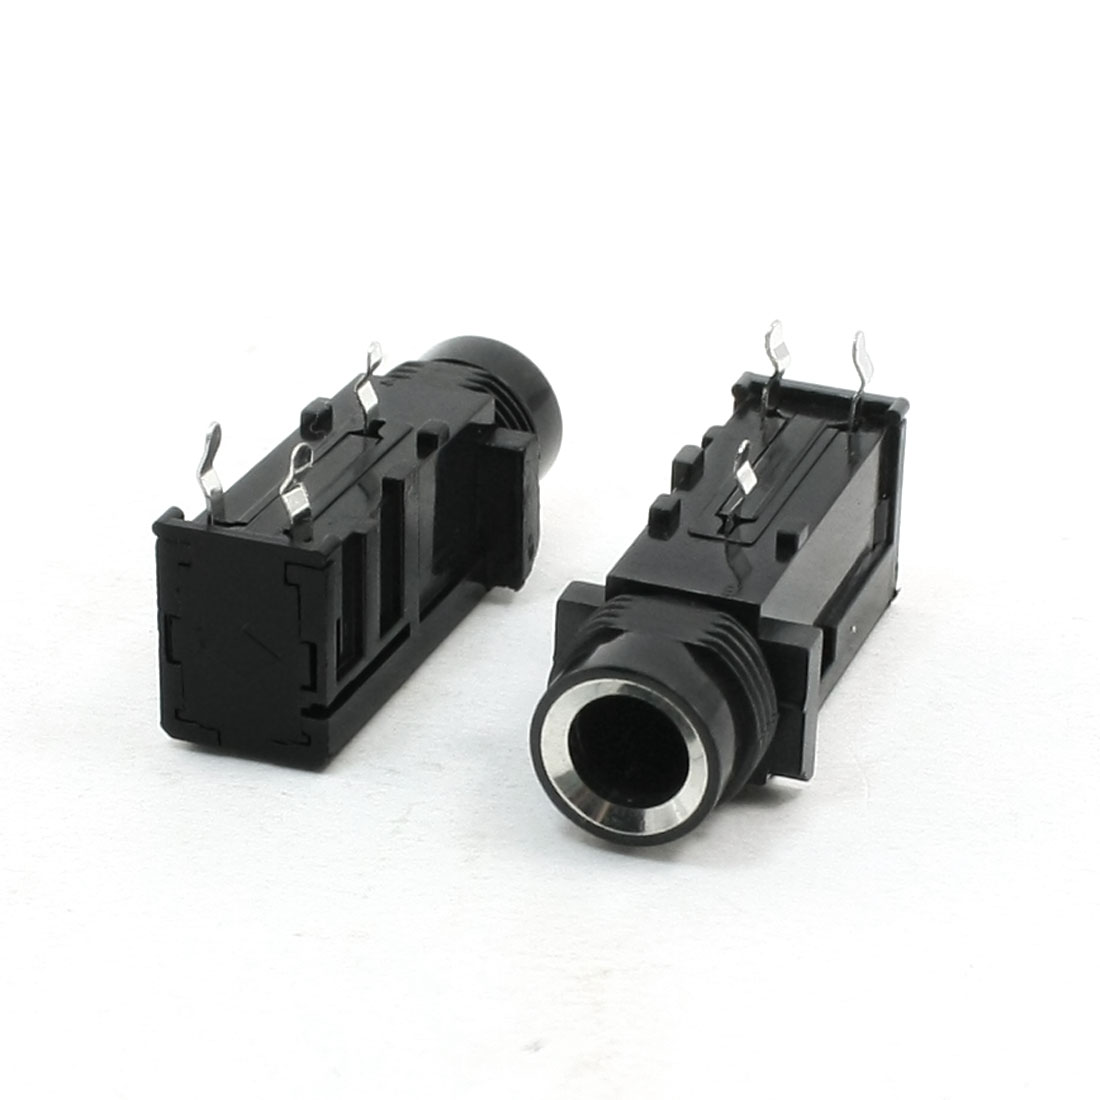 Replacement Black PCB Mounting 6.5mm 3 Terminal Audio Jack Socket 2Pcs